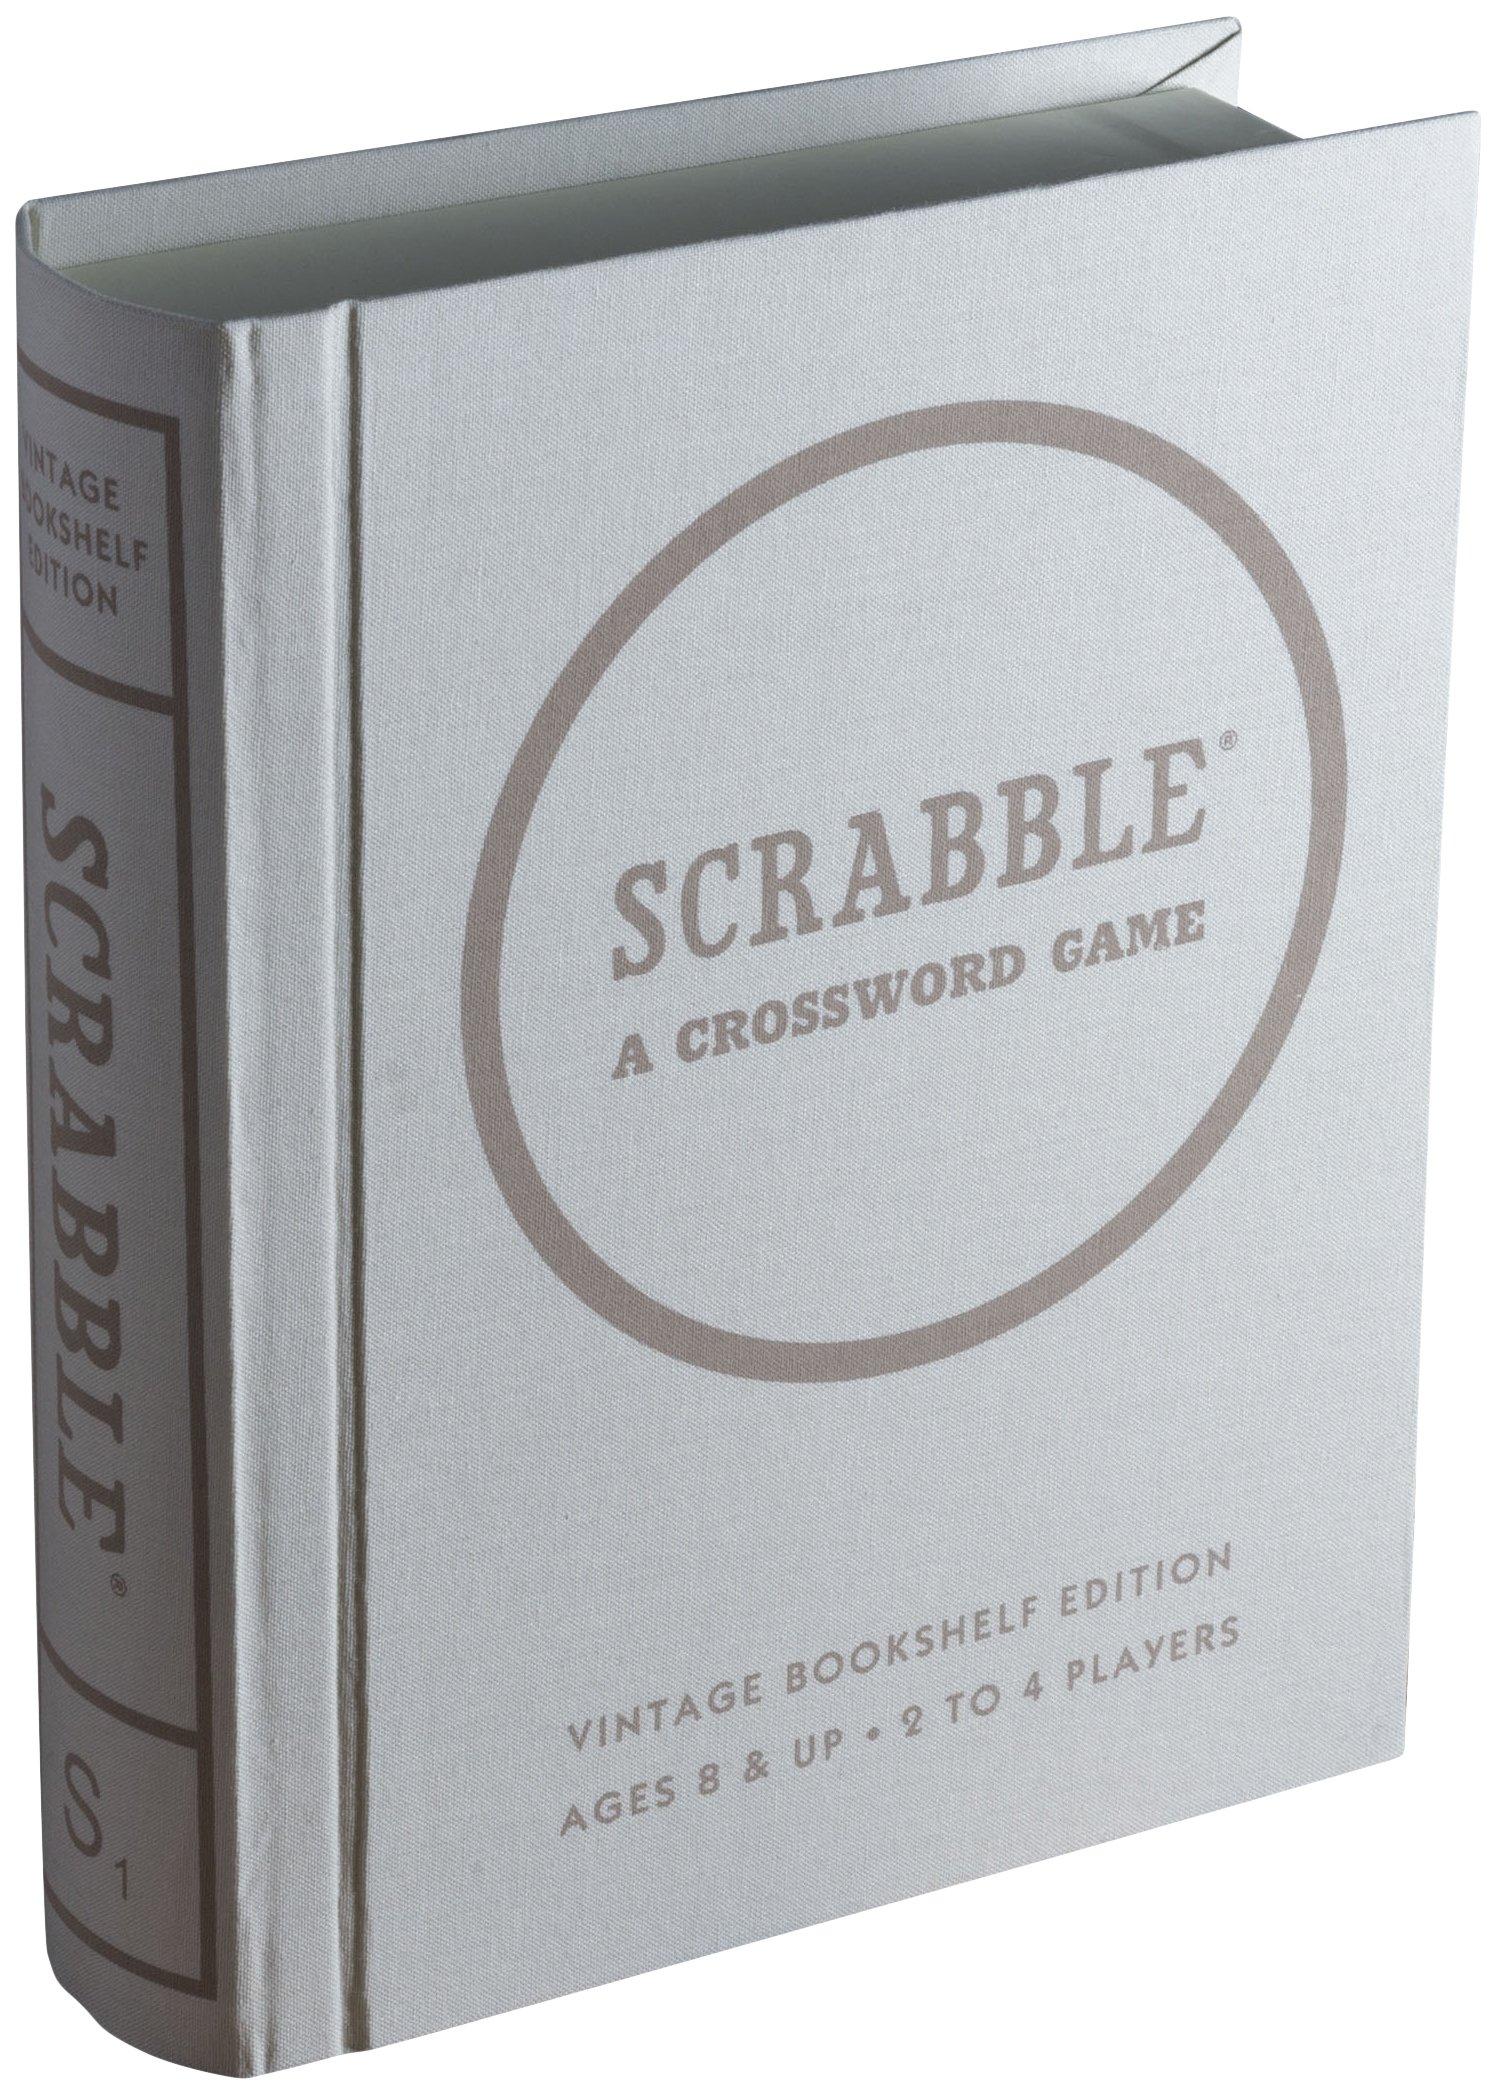 Scrabble Linen Vintage Bookshelf Edition